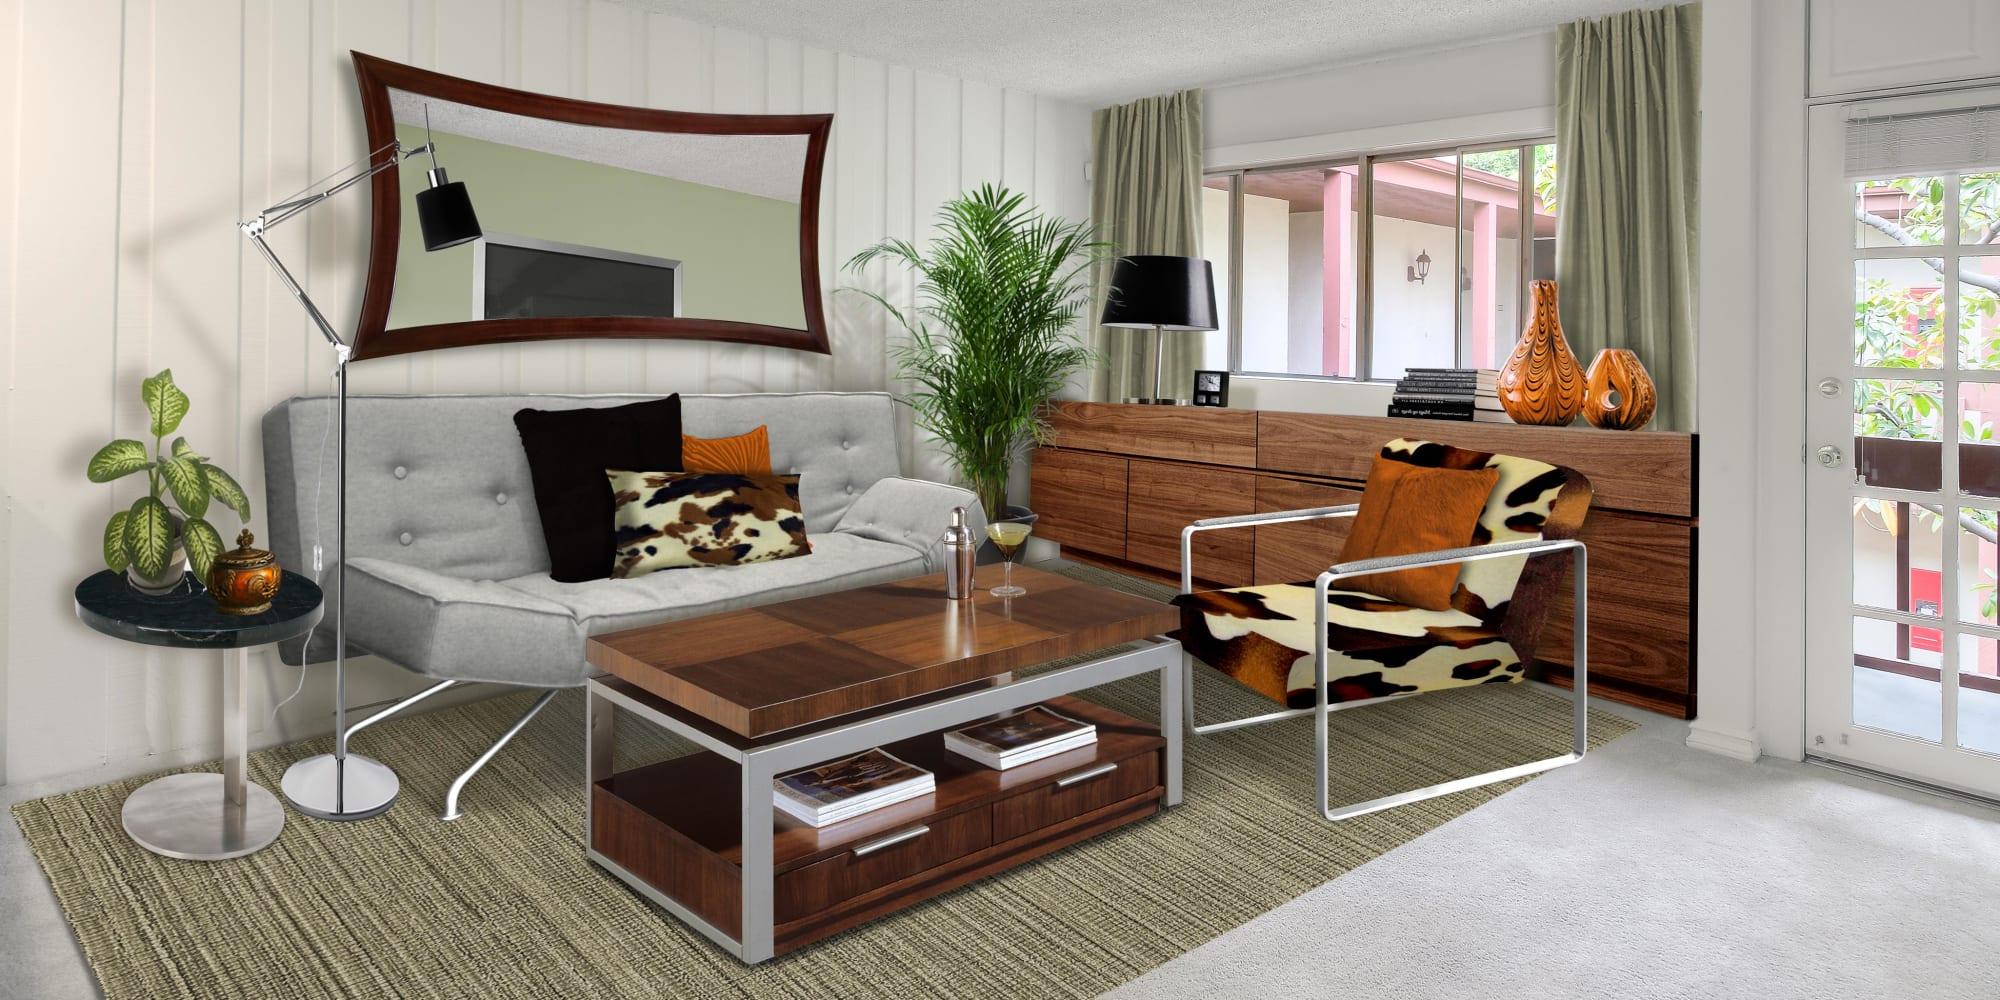 View a virtual tour of a studio apartment at Rancho Los Feliz in Los Angeles, California